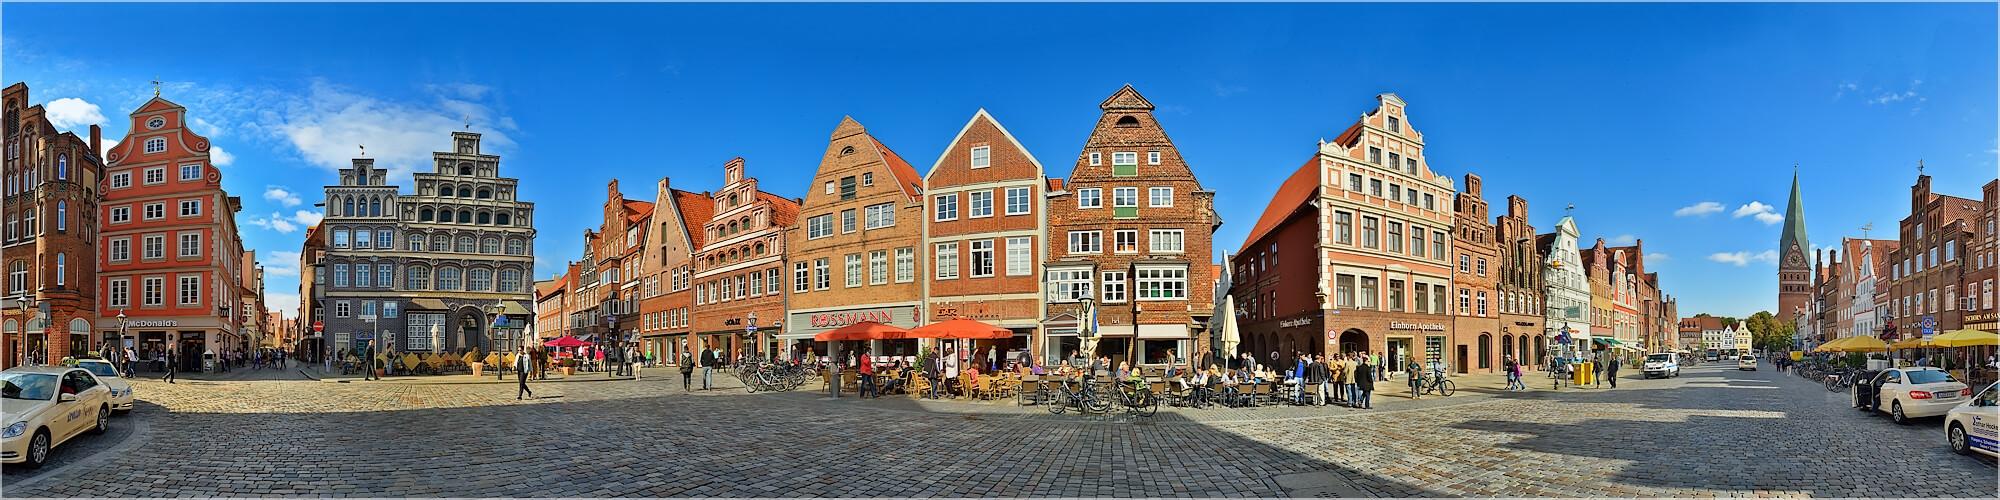 Panoramabild Lüneburg am Marktplatz